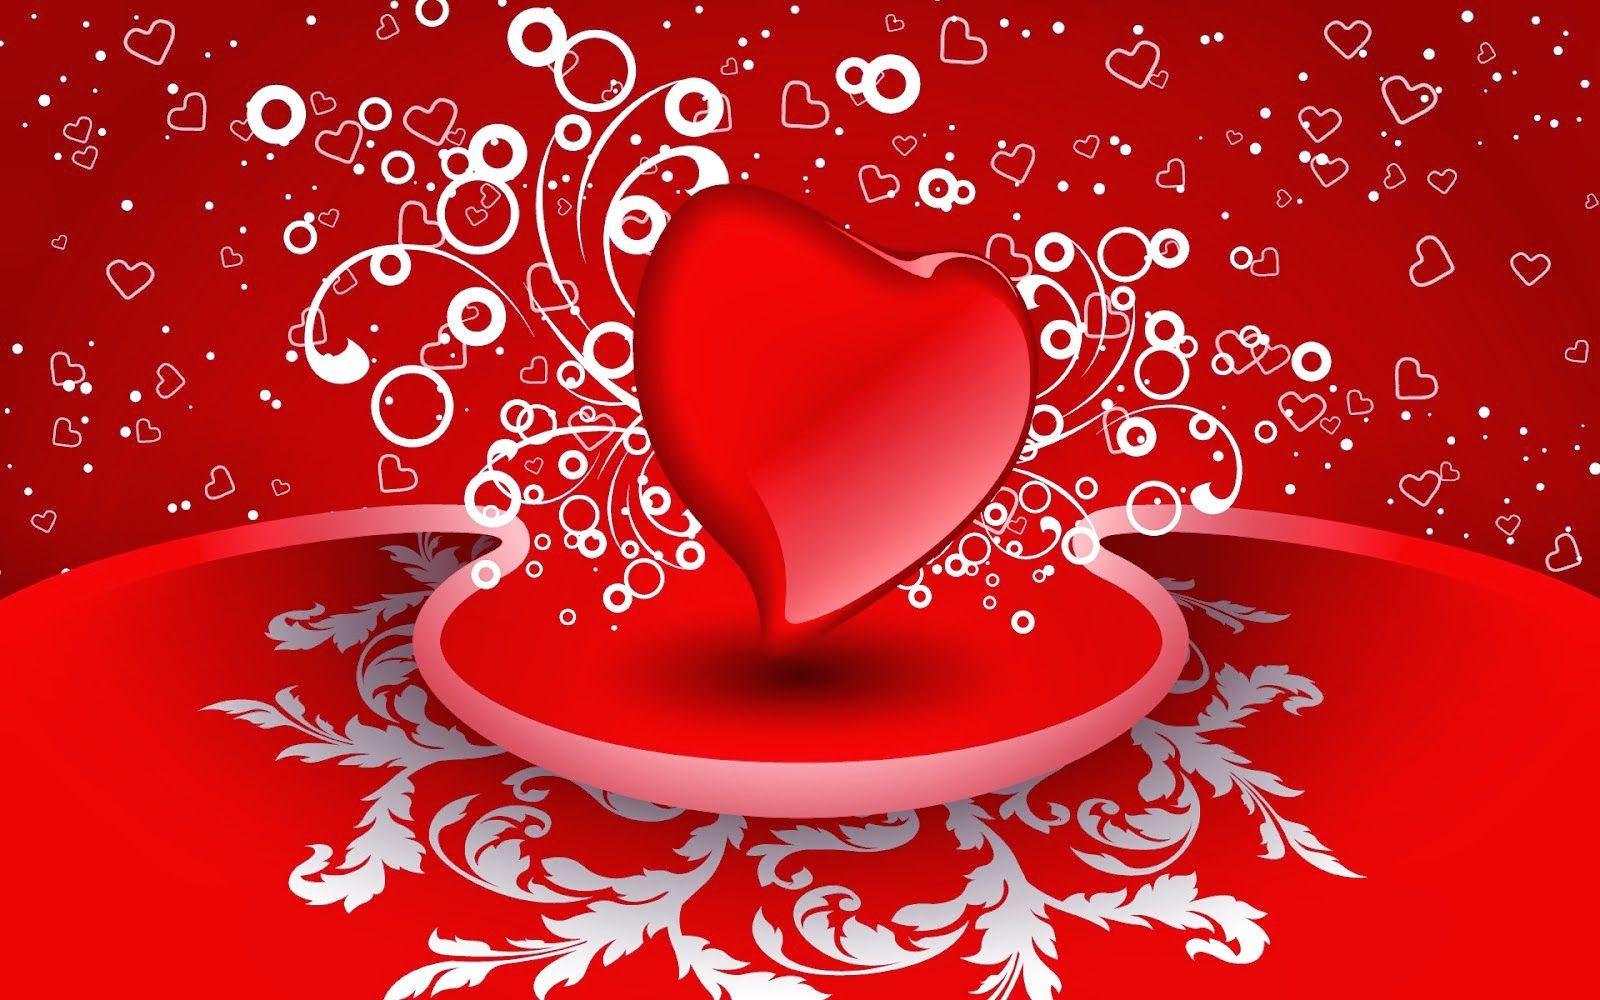 Flight Of Love Valentine Wallpapers